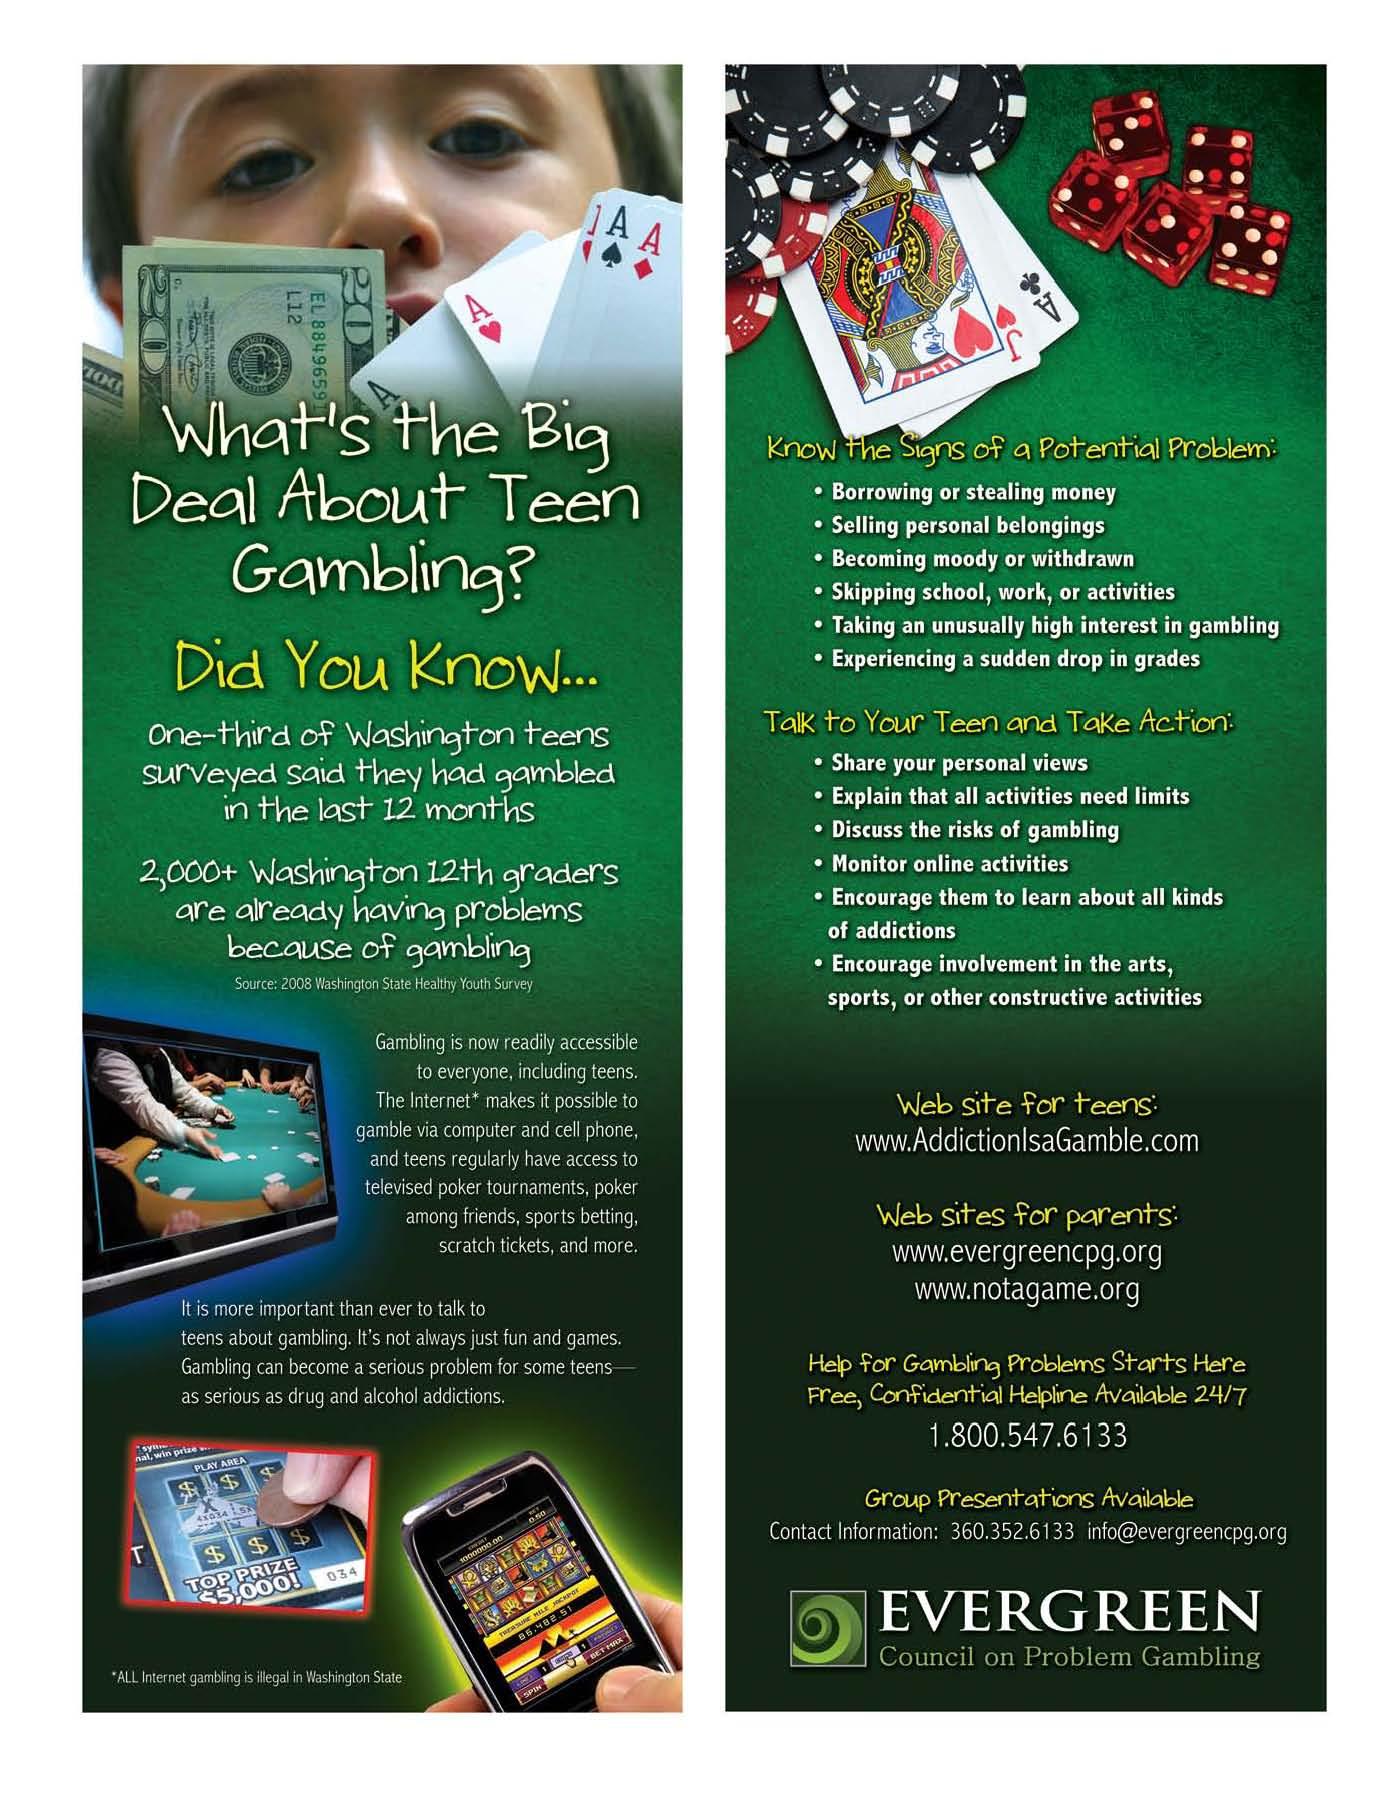 Teenage gambling facts